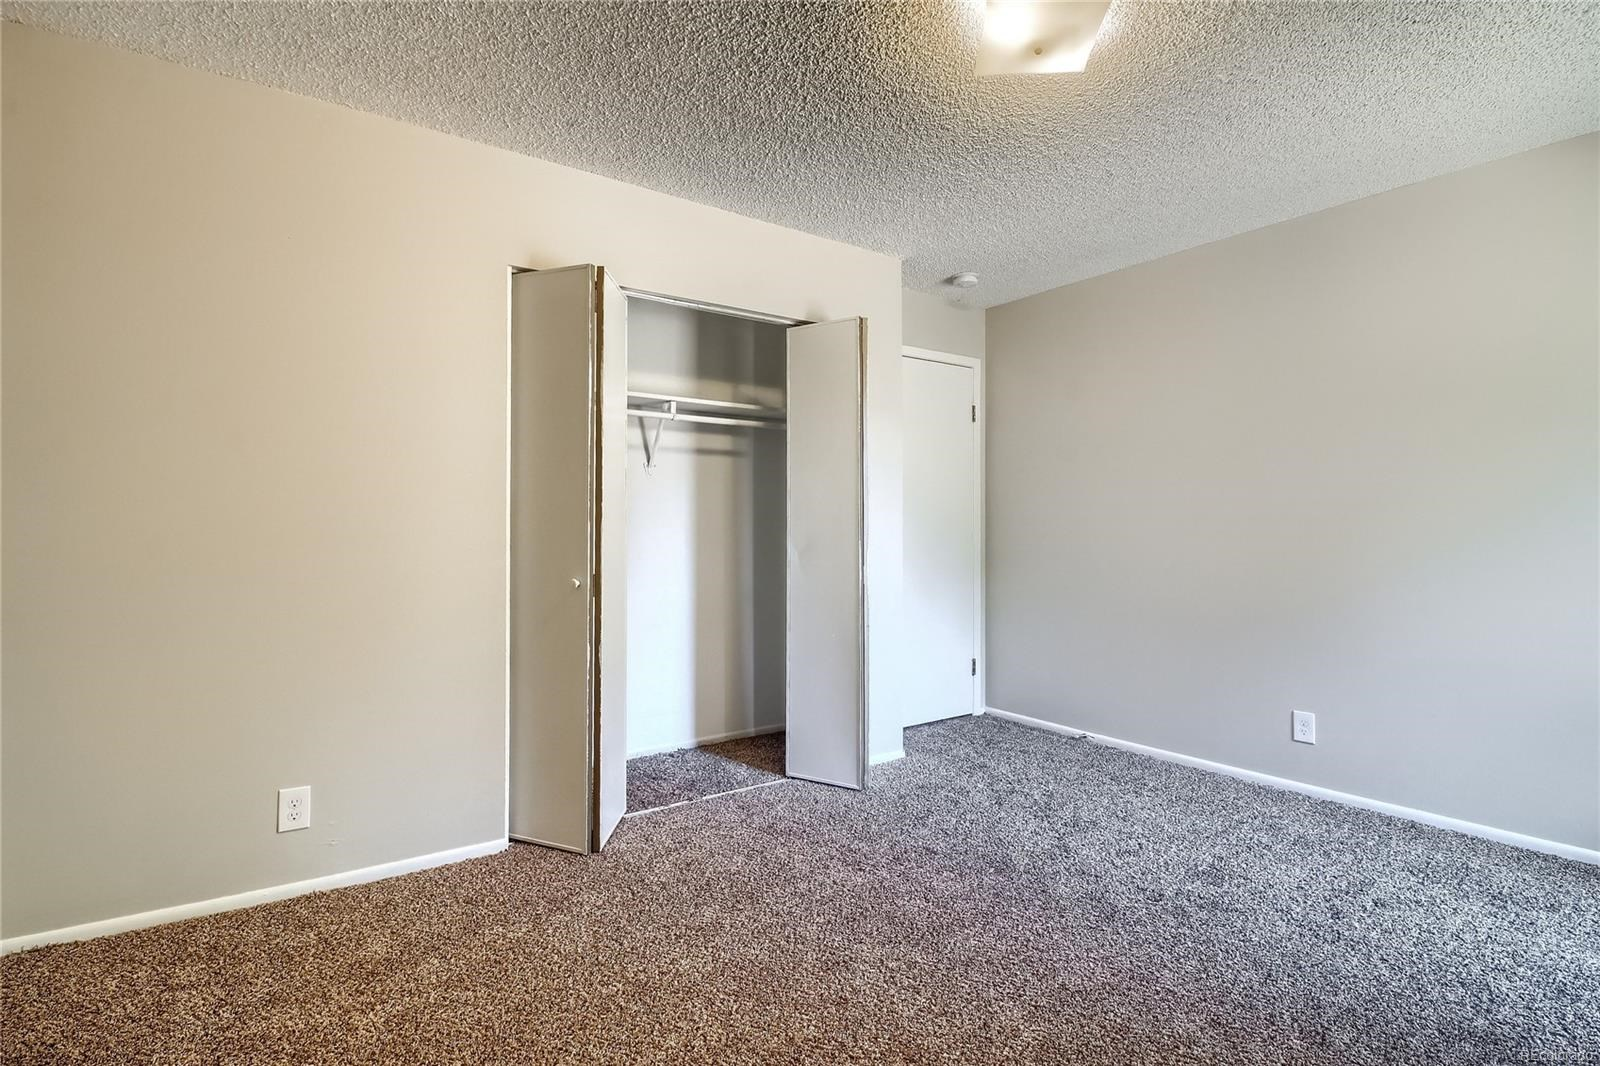 MLS# 4817896 - 26 - 5080 Worchester Street, Denver, CO 80239